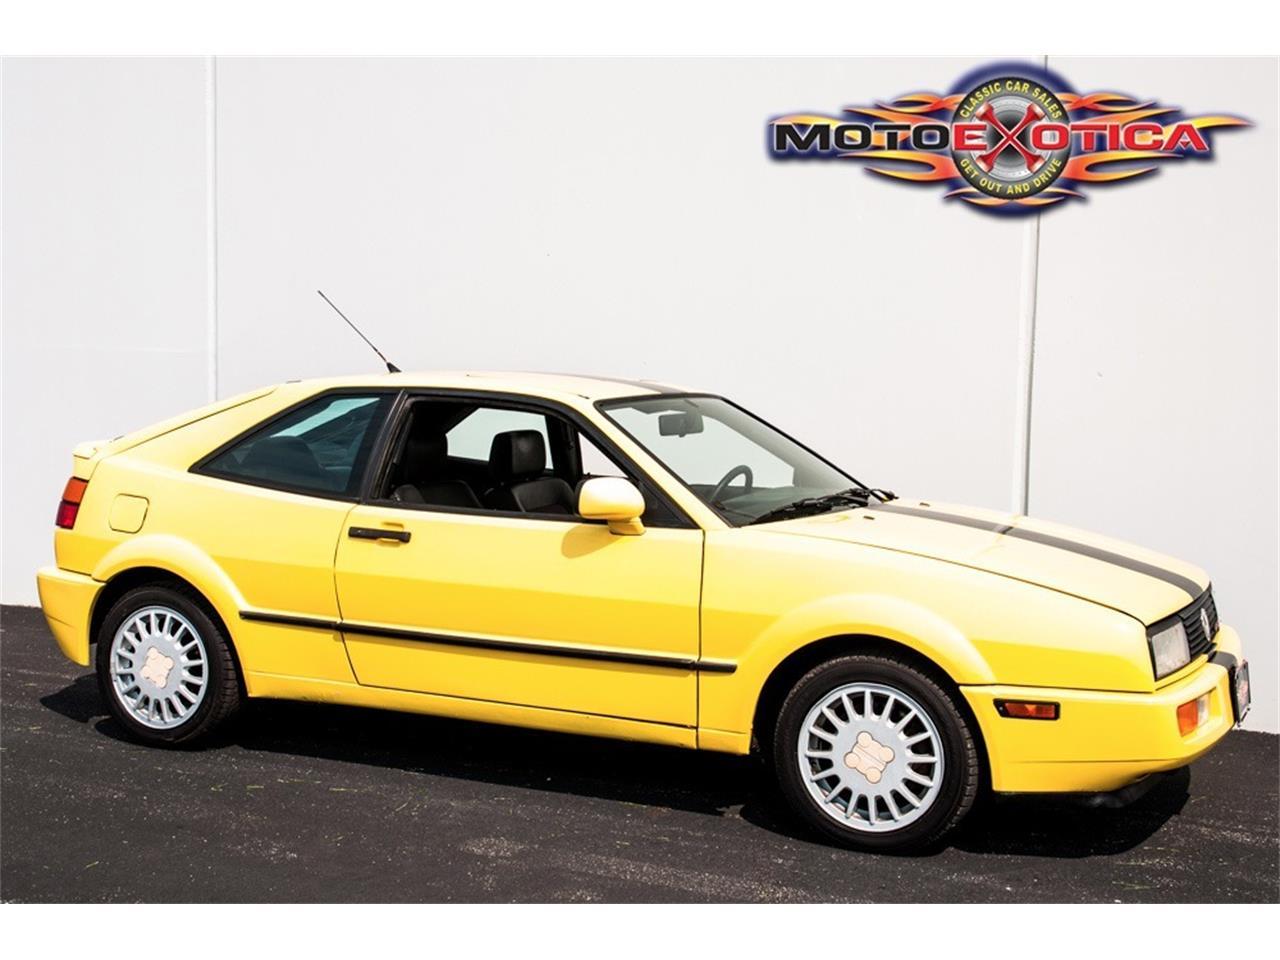 1990 Volkswagen Corrado G60 For Sale Classiccars Com